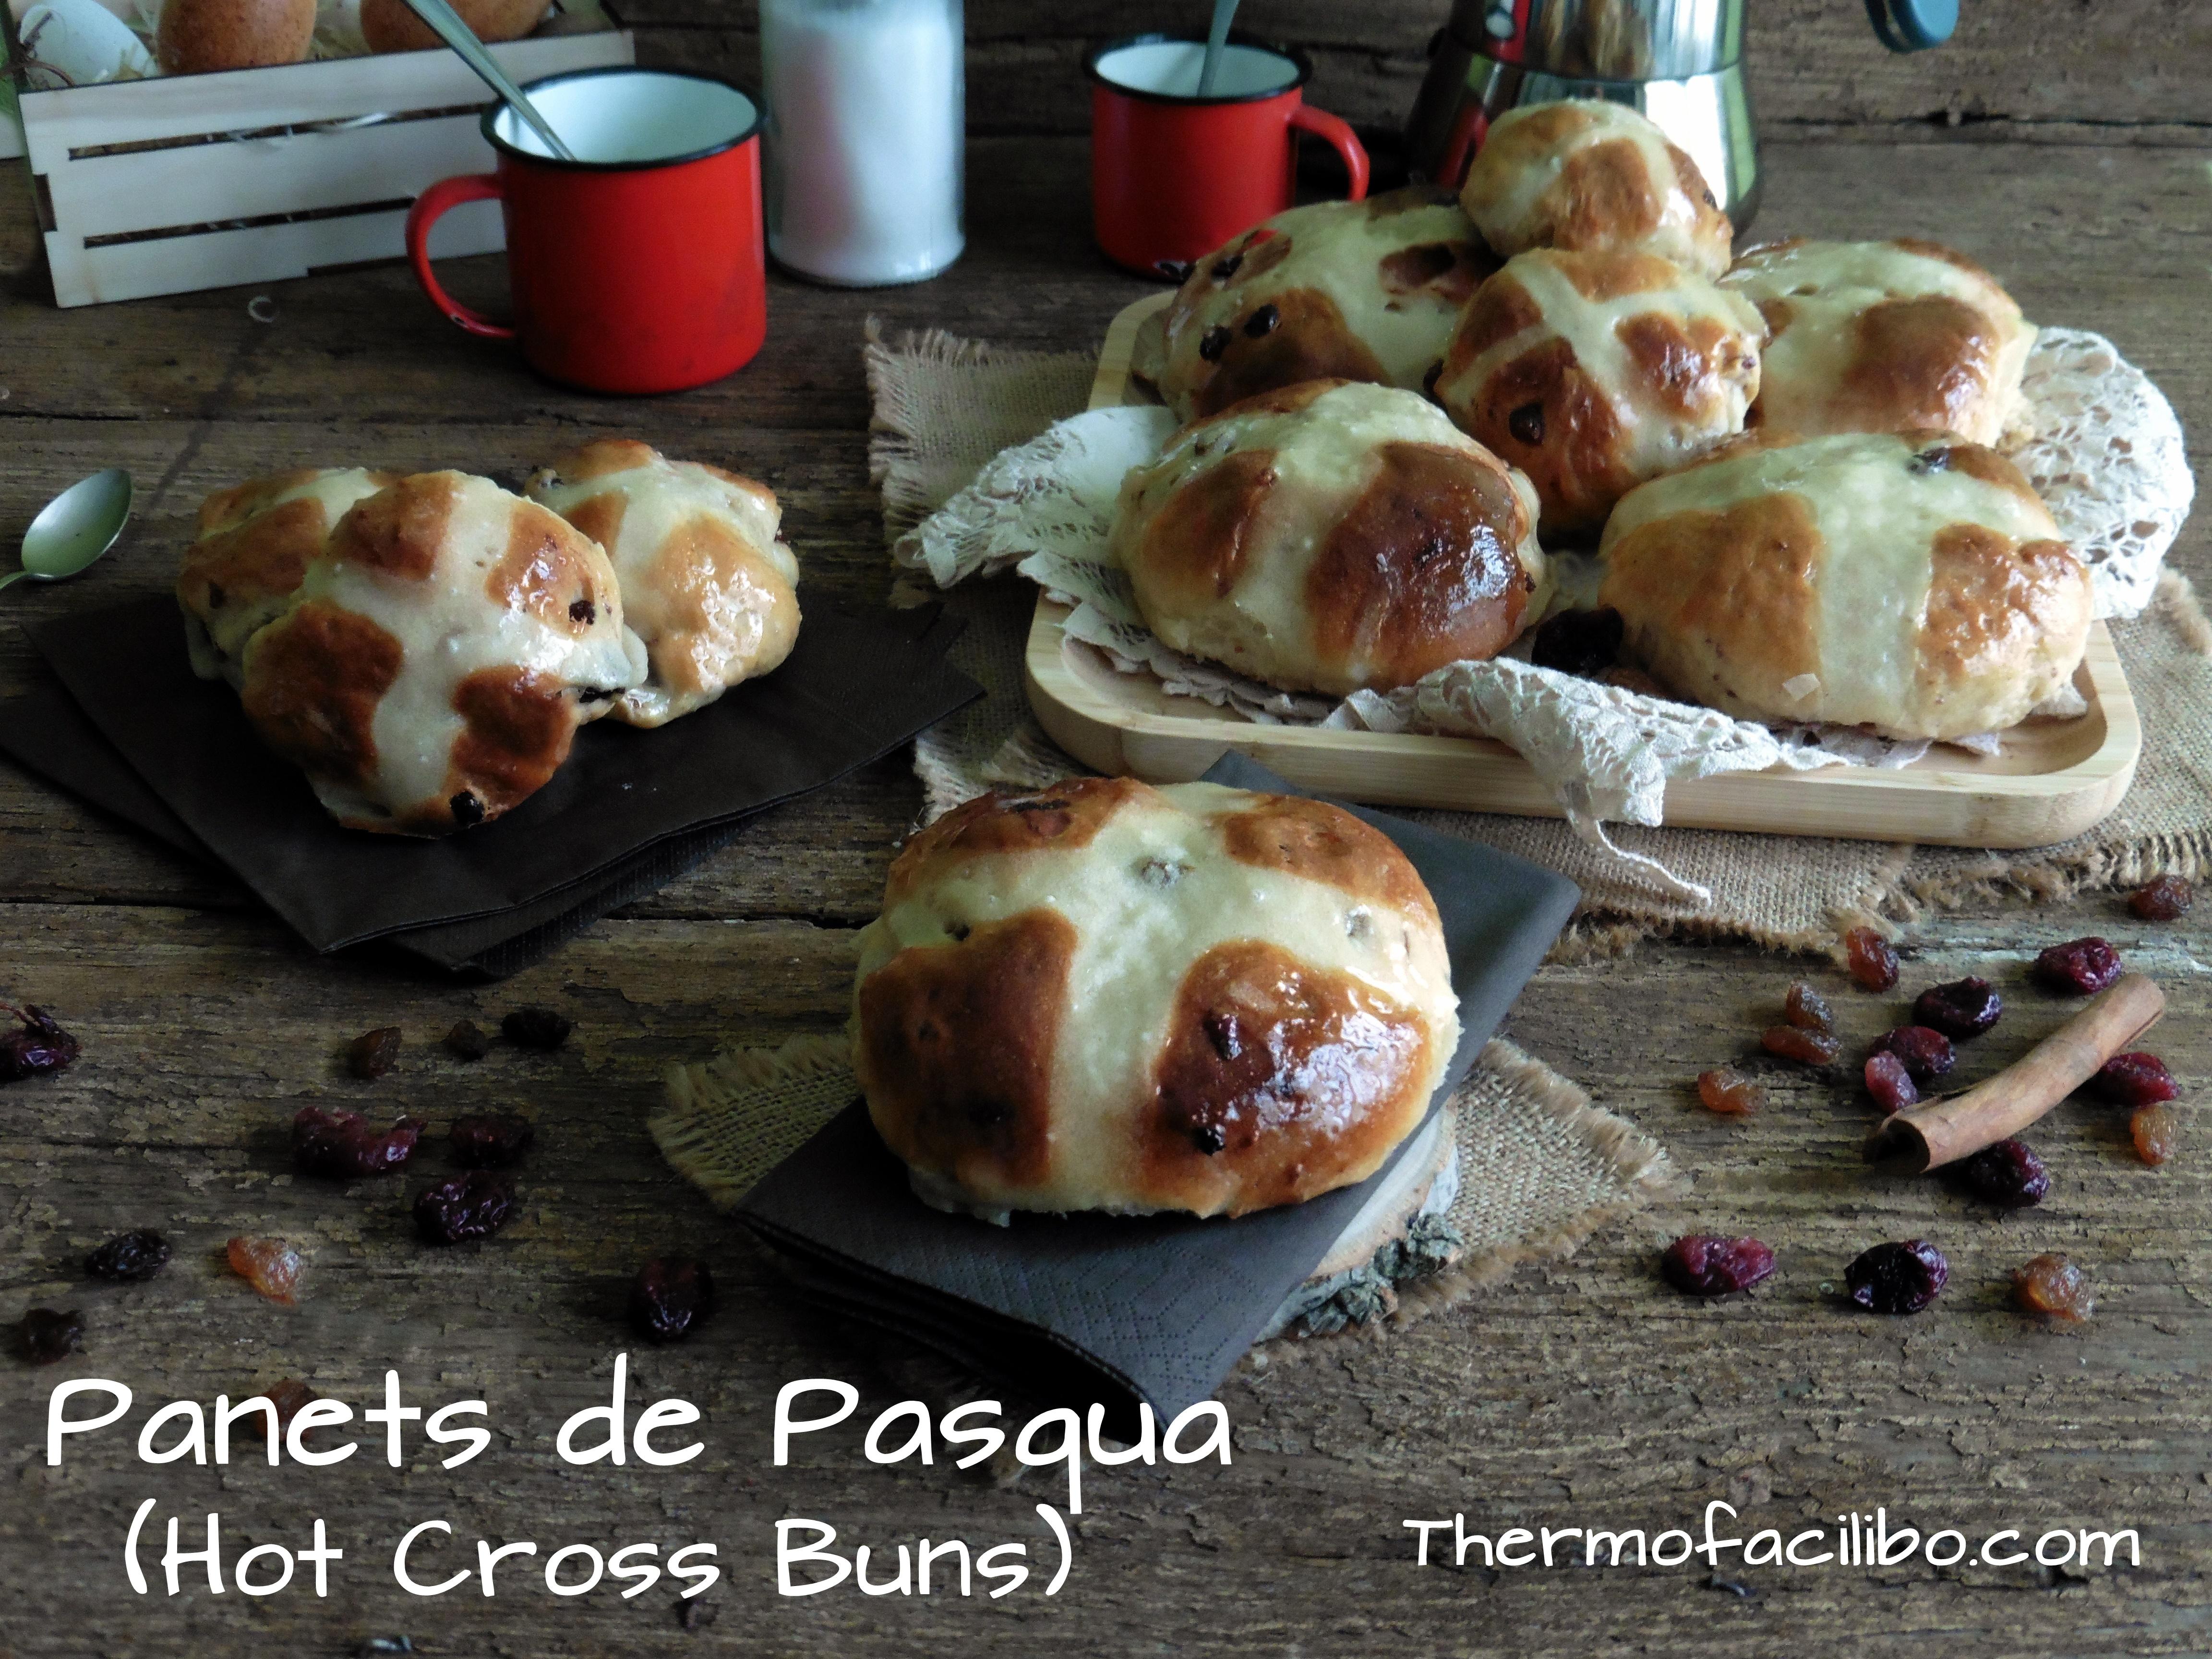 Panets de Pasqua (Hot Cross Buns)1